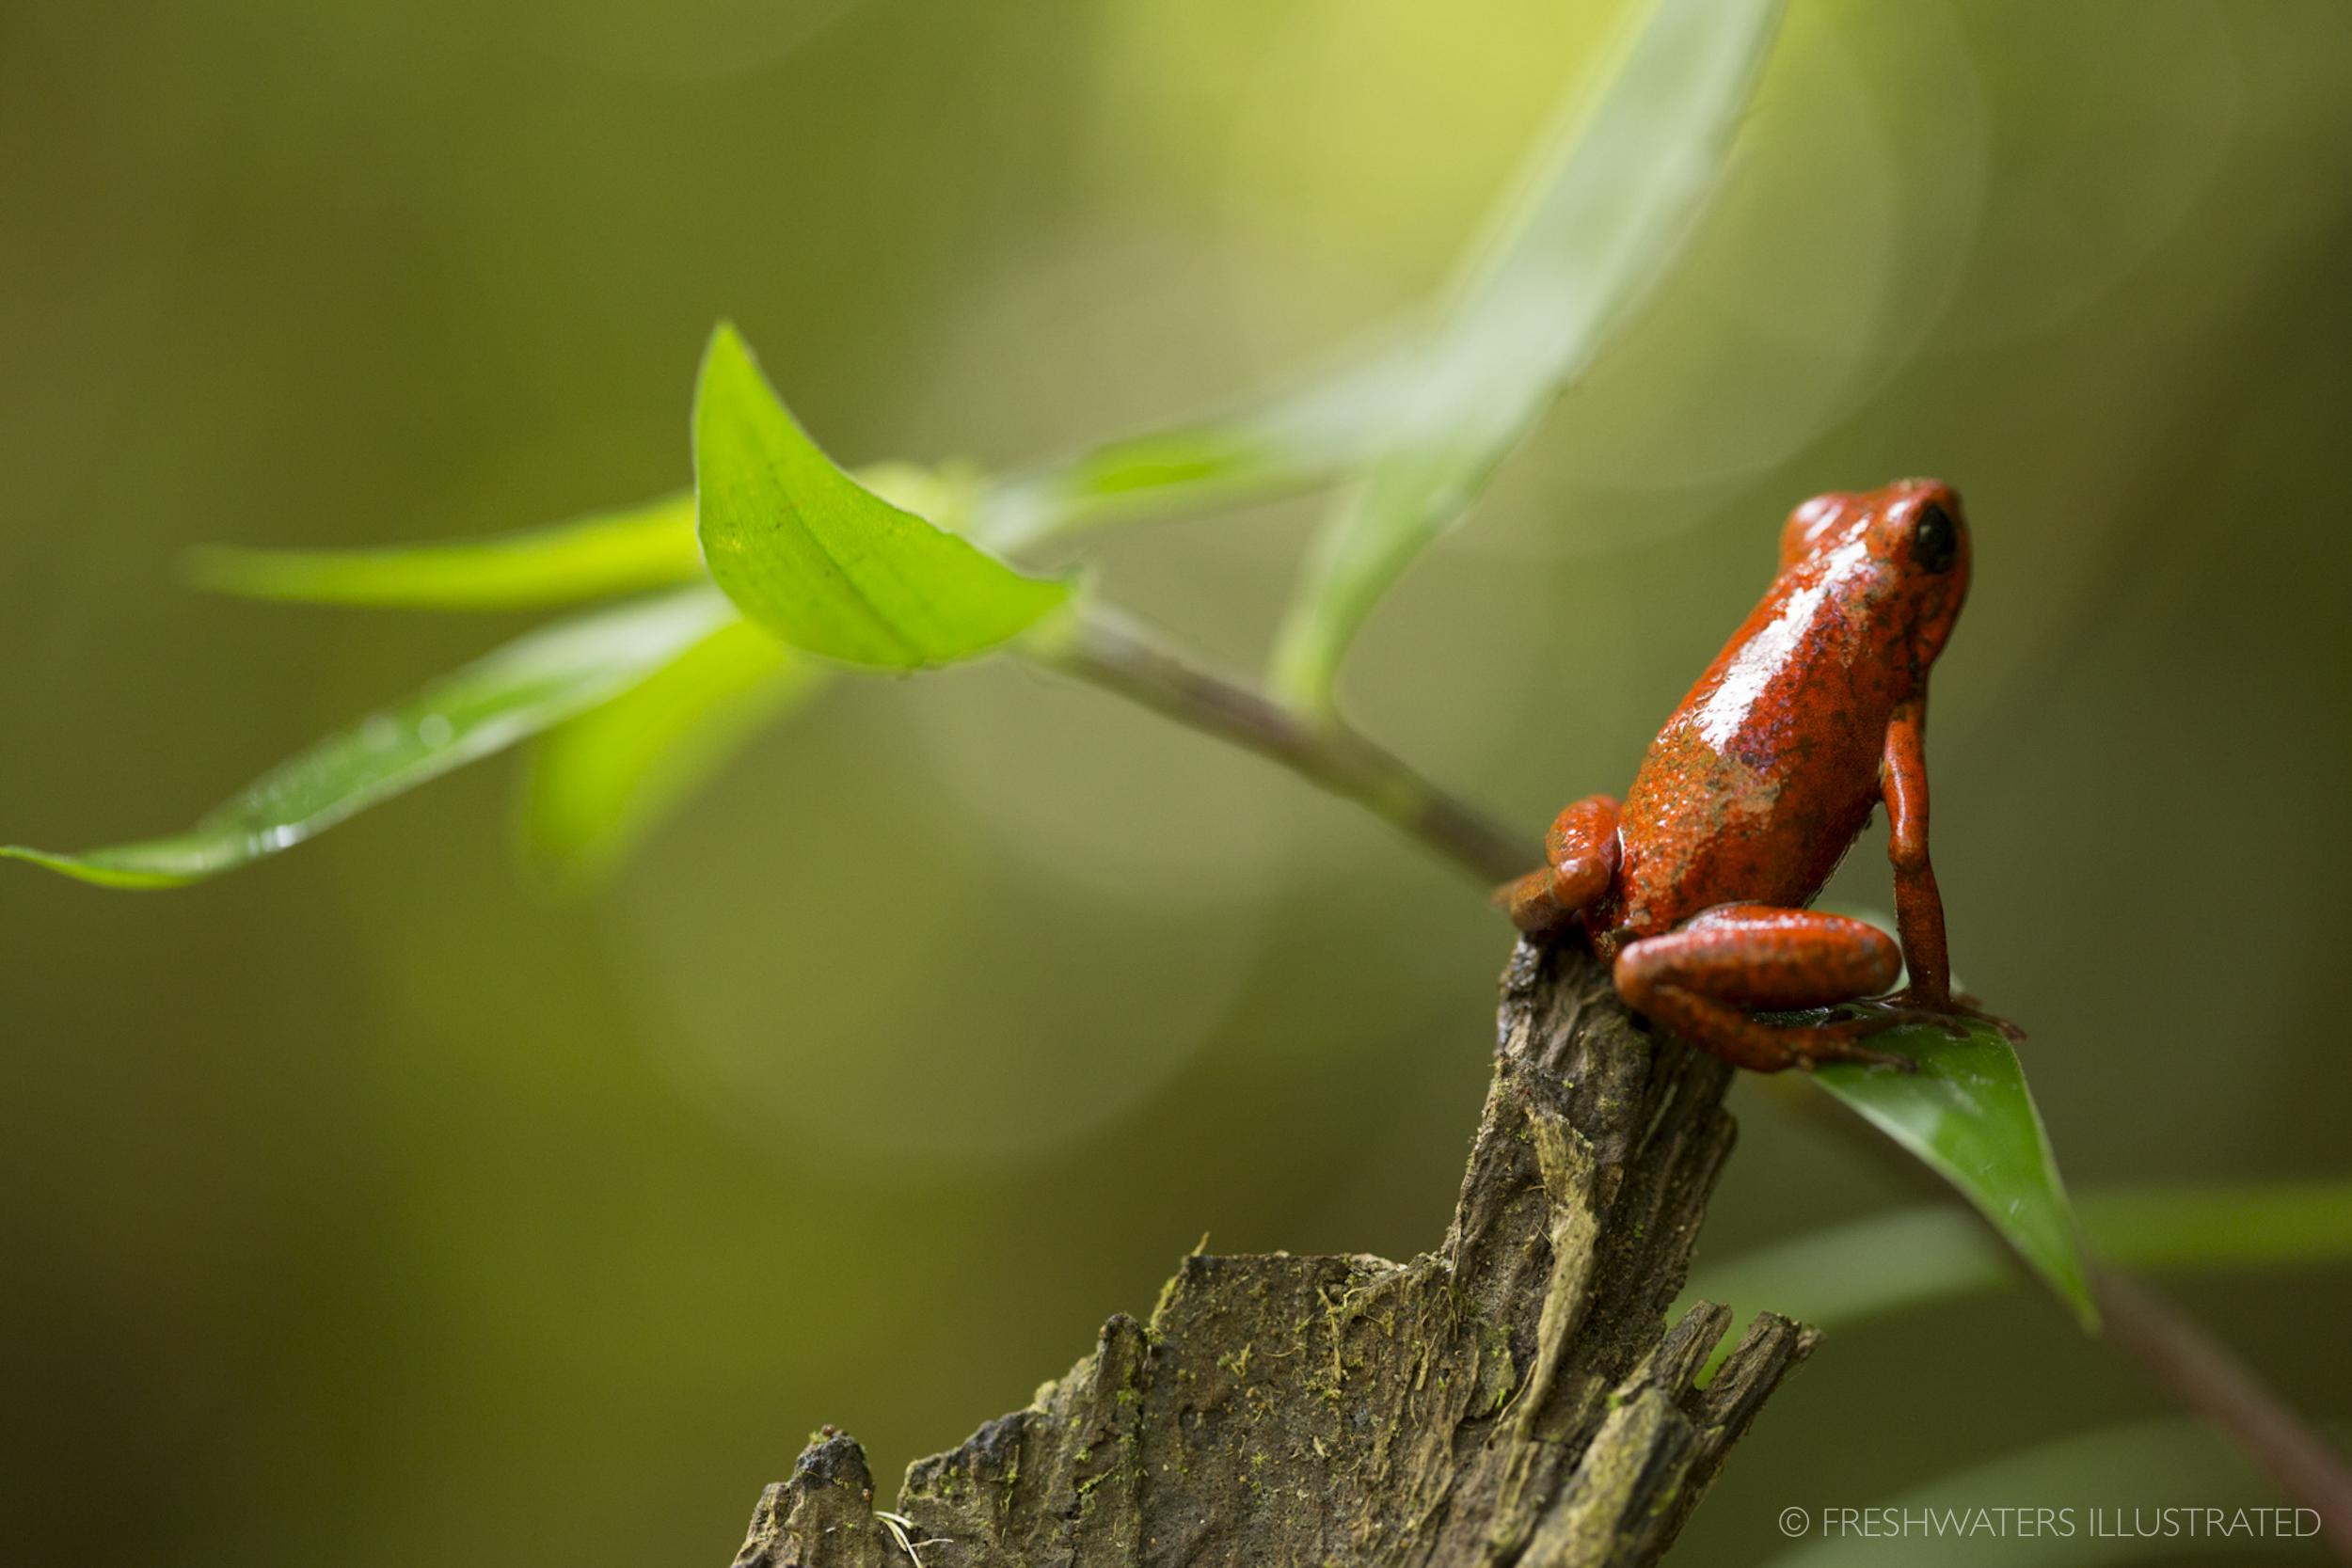 Strawberry poison-dart frog (Oophaga pumilio) Rio Carbon, Costa Rica